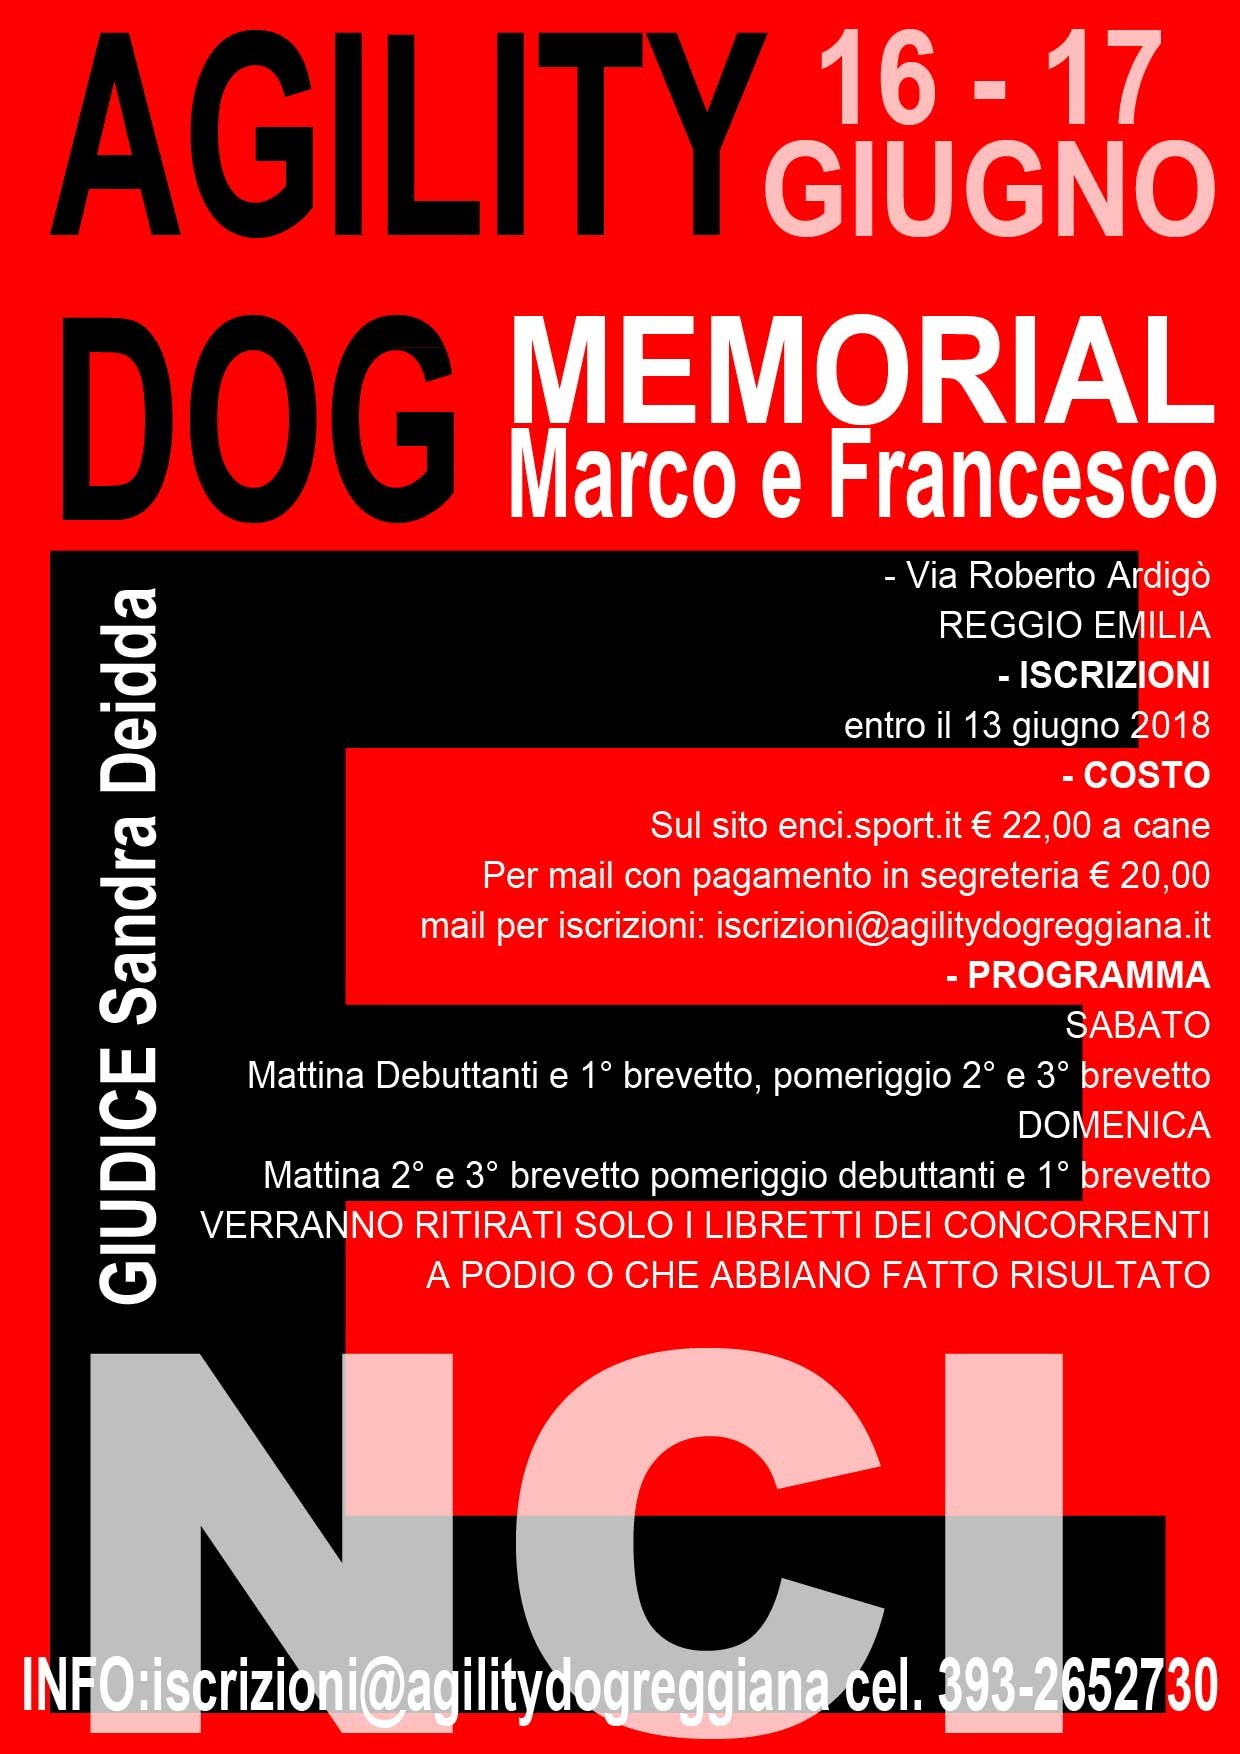 Memorial Marco e Francesco